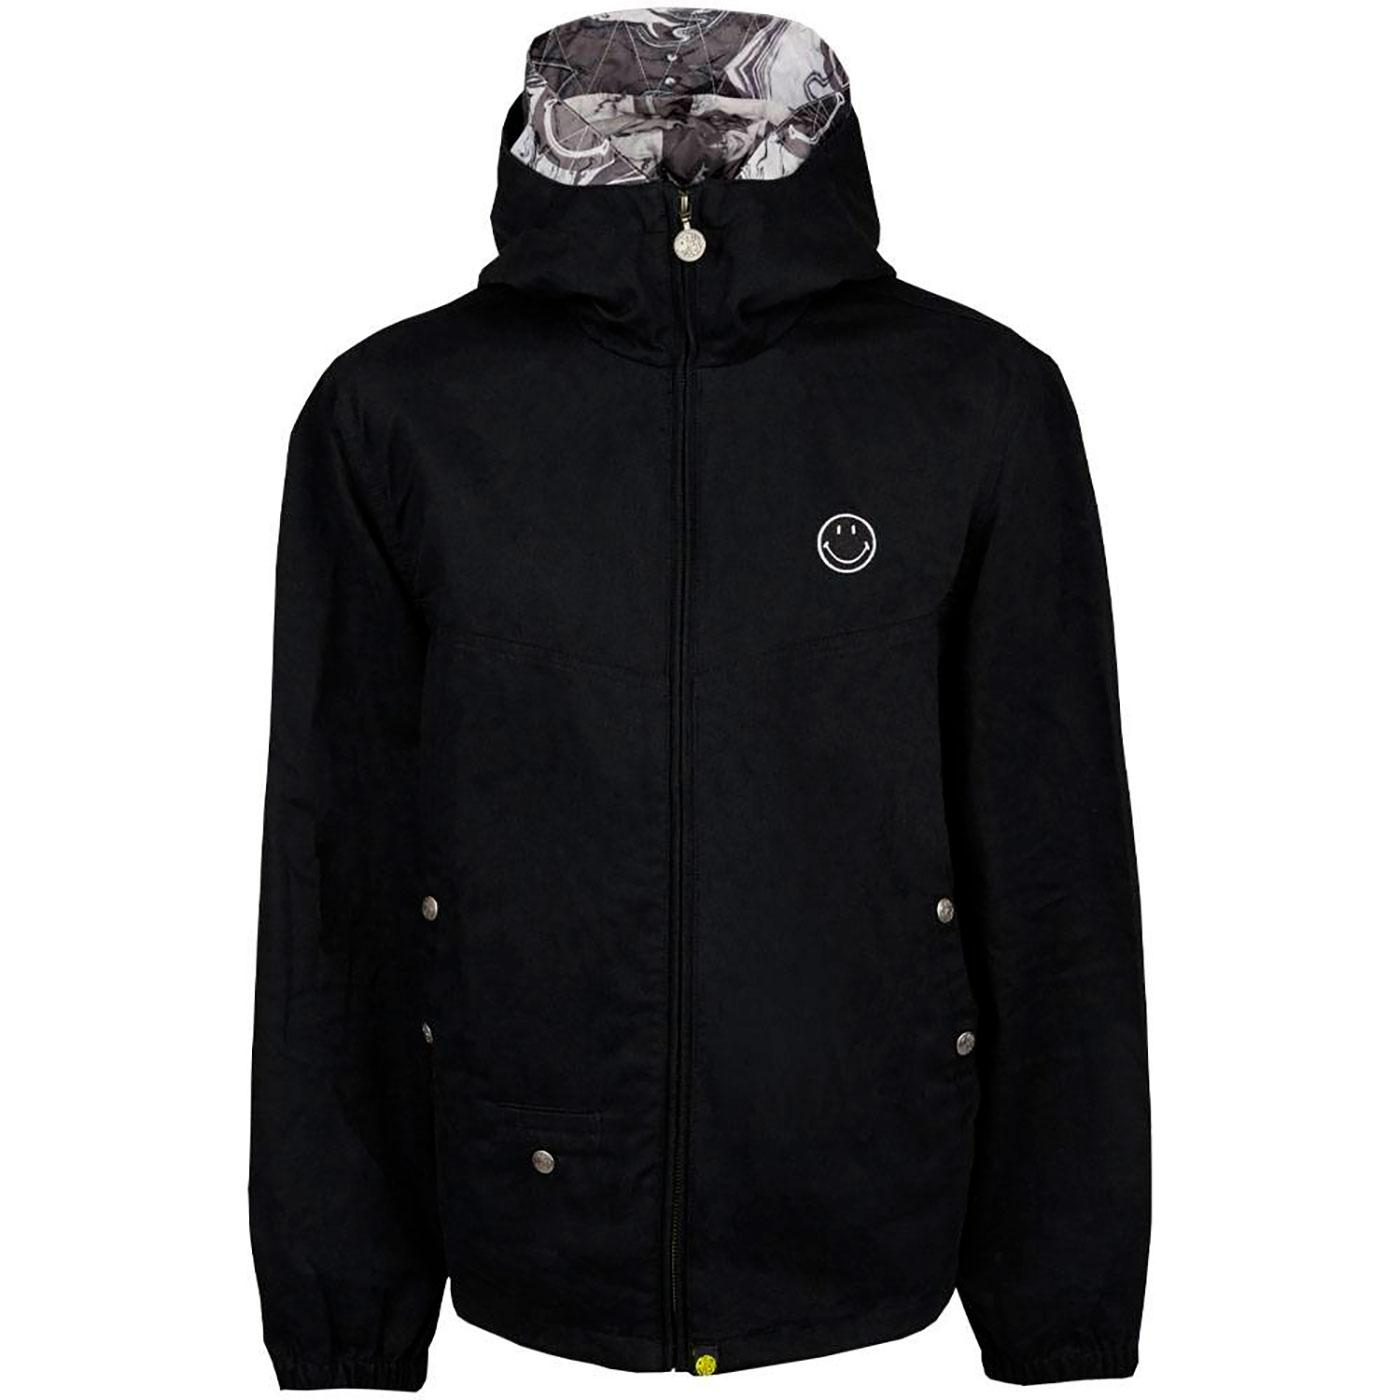 PRETTY GREEN X SMILEY® Retro 90's Hooded Jacket